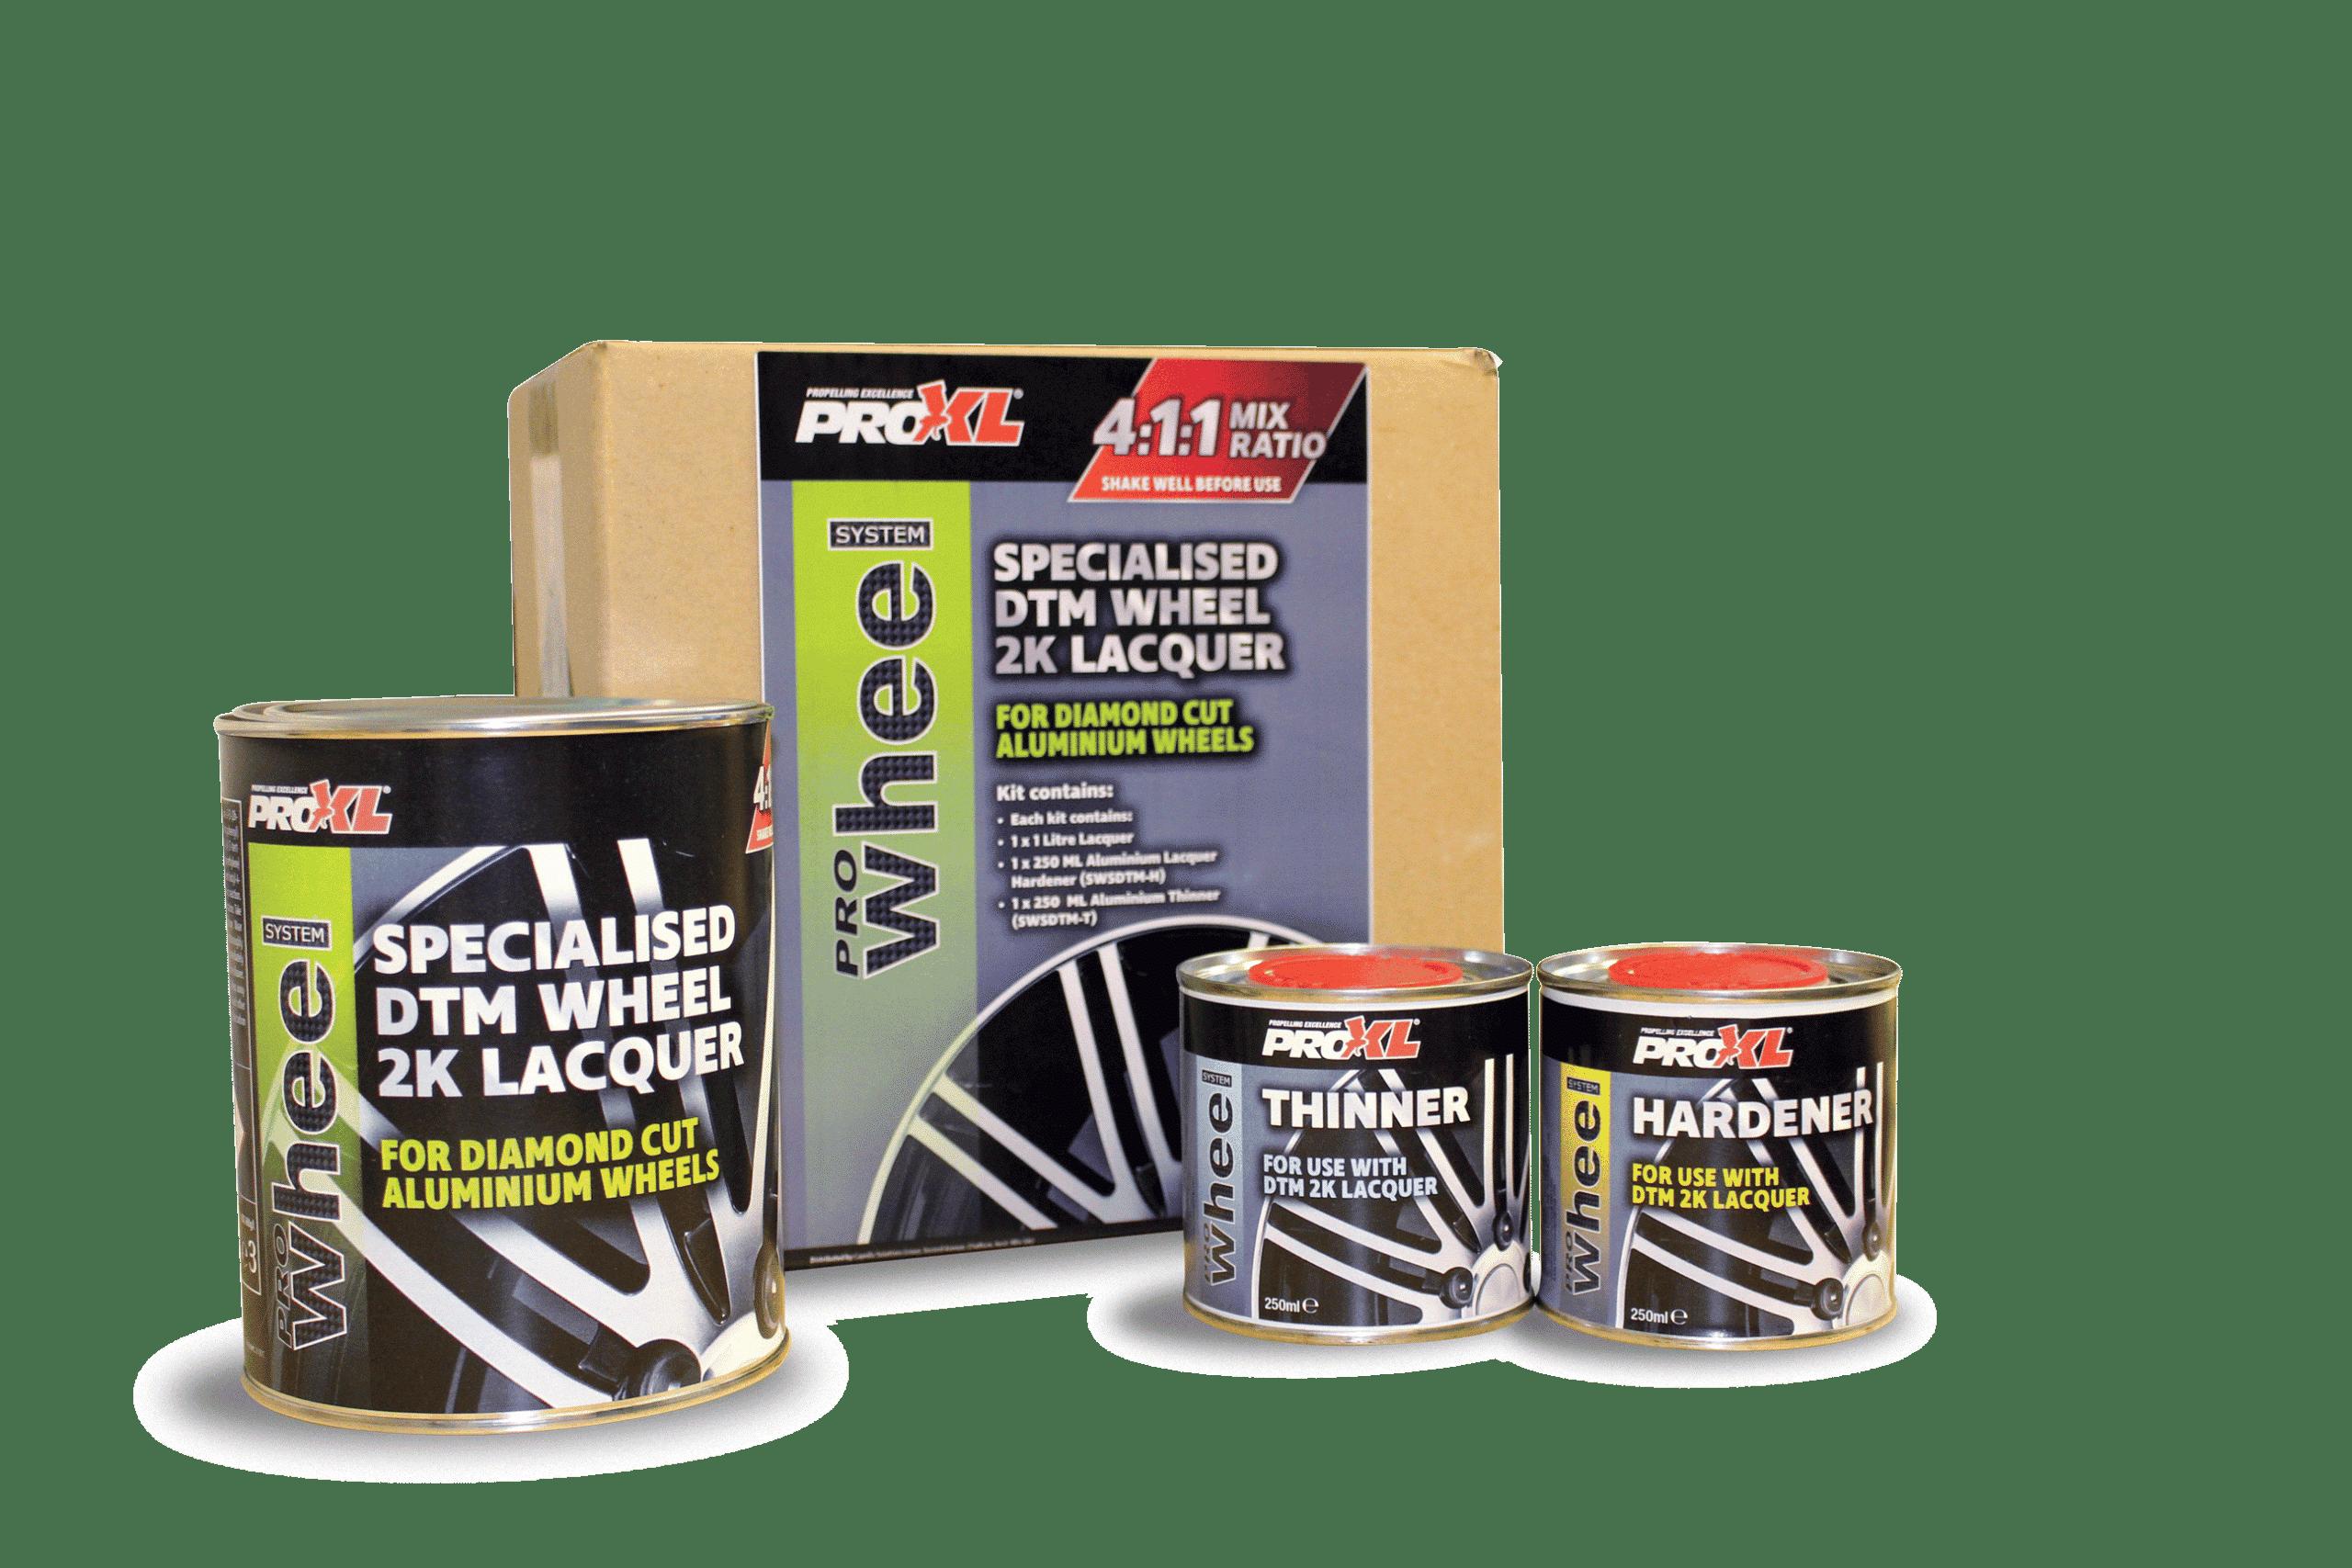 ProWheel DTM Aluminium Satin Lacquer Kit (1.5lt) Product Image